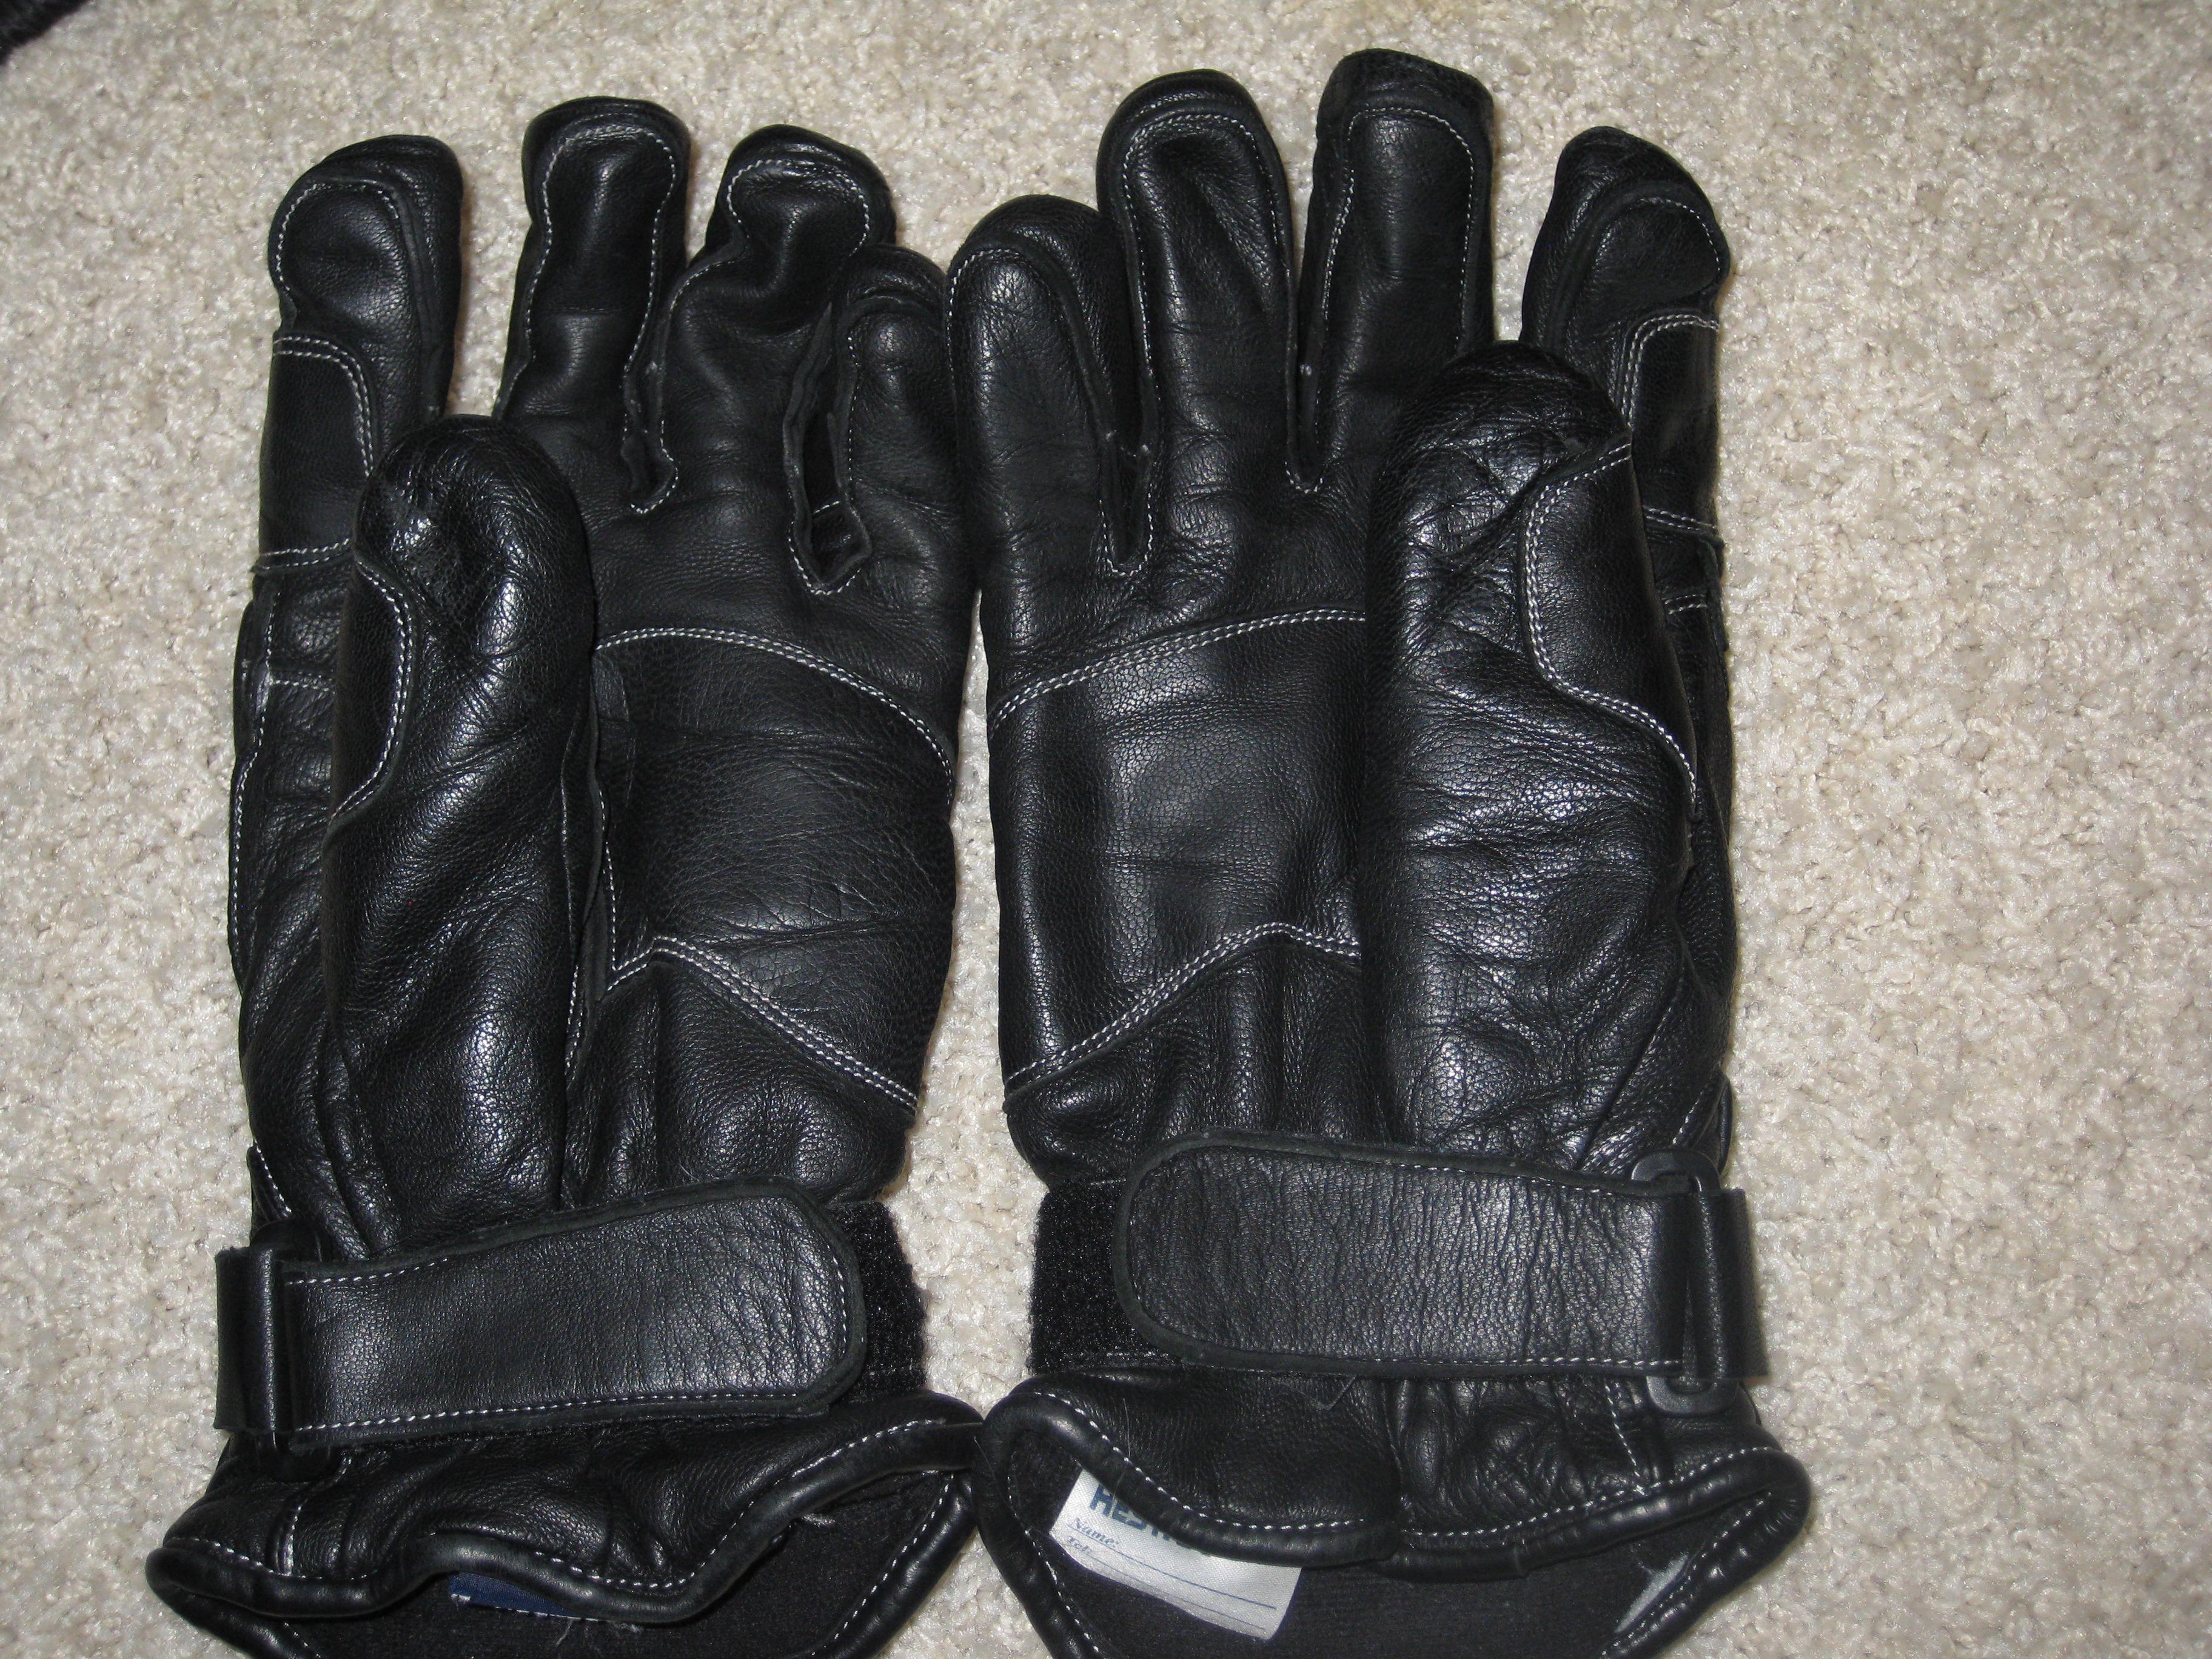 Hestra gloves-bottom